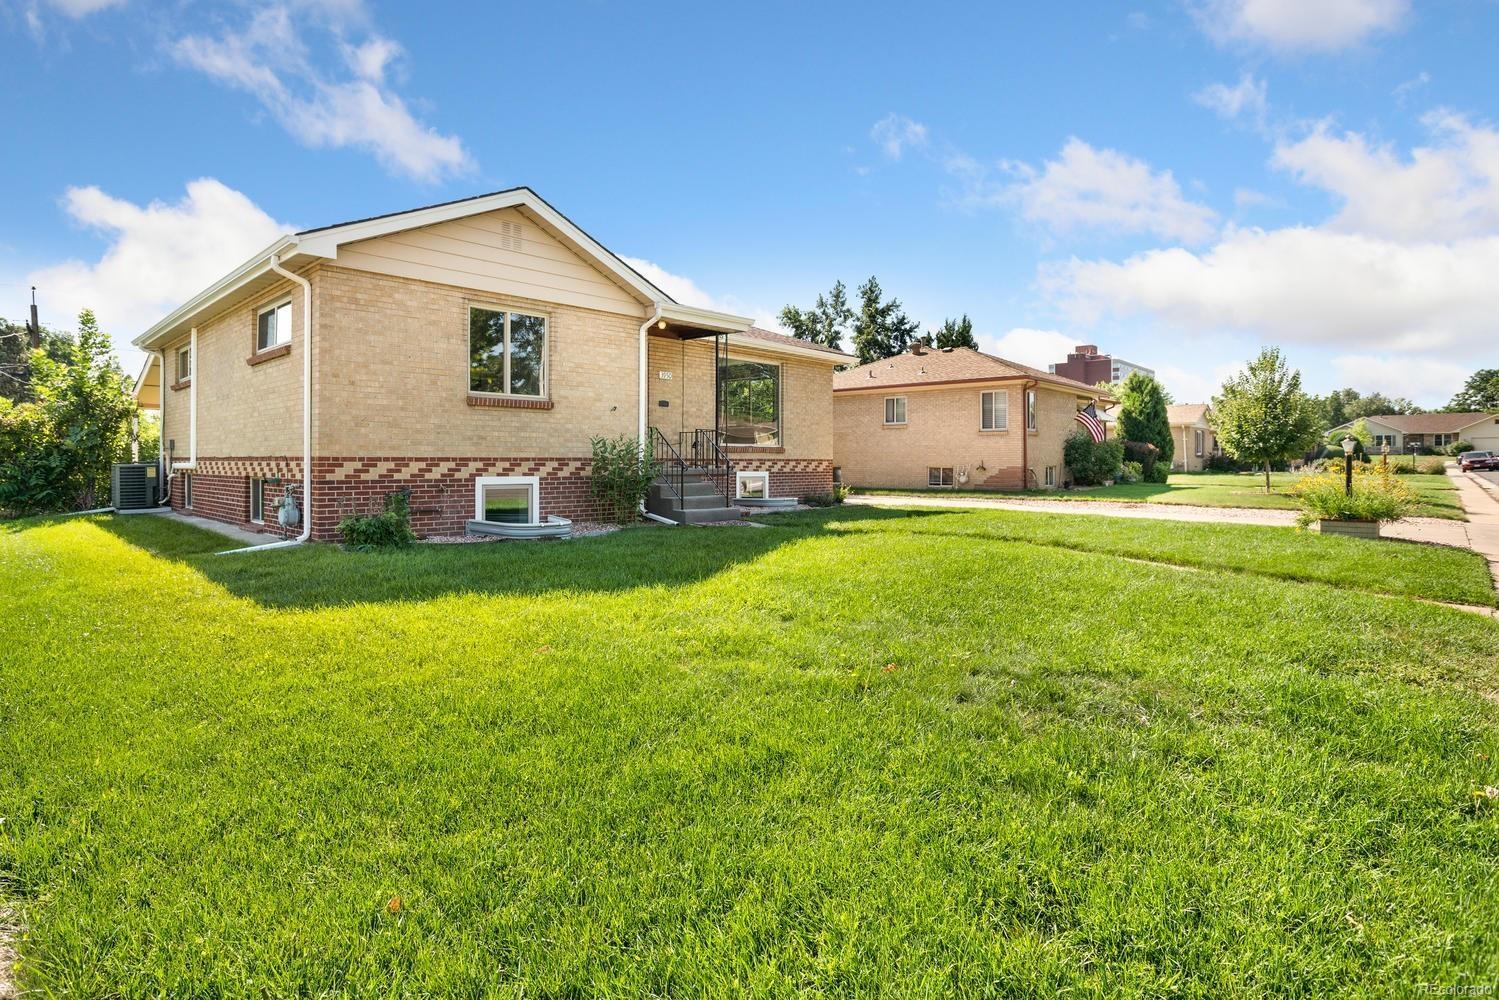 MLS# 8304714 - 34 - 3950 Lamar Street, Wheat Ridge, CO 80033